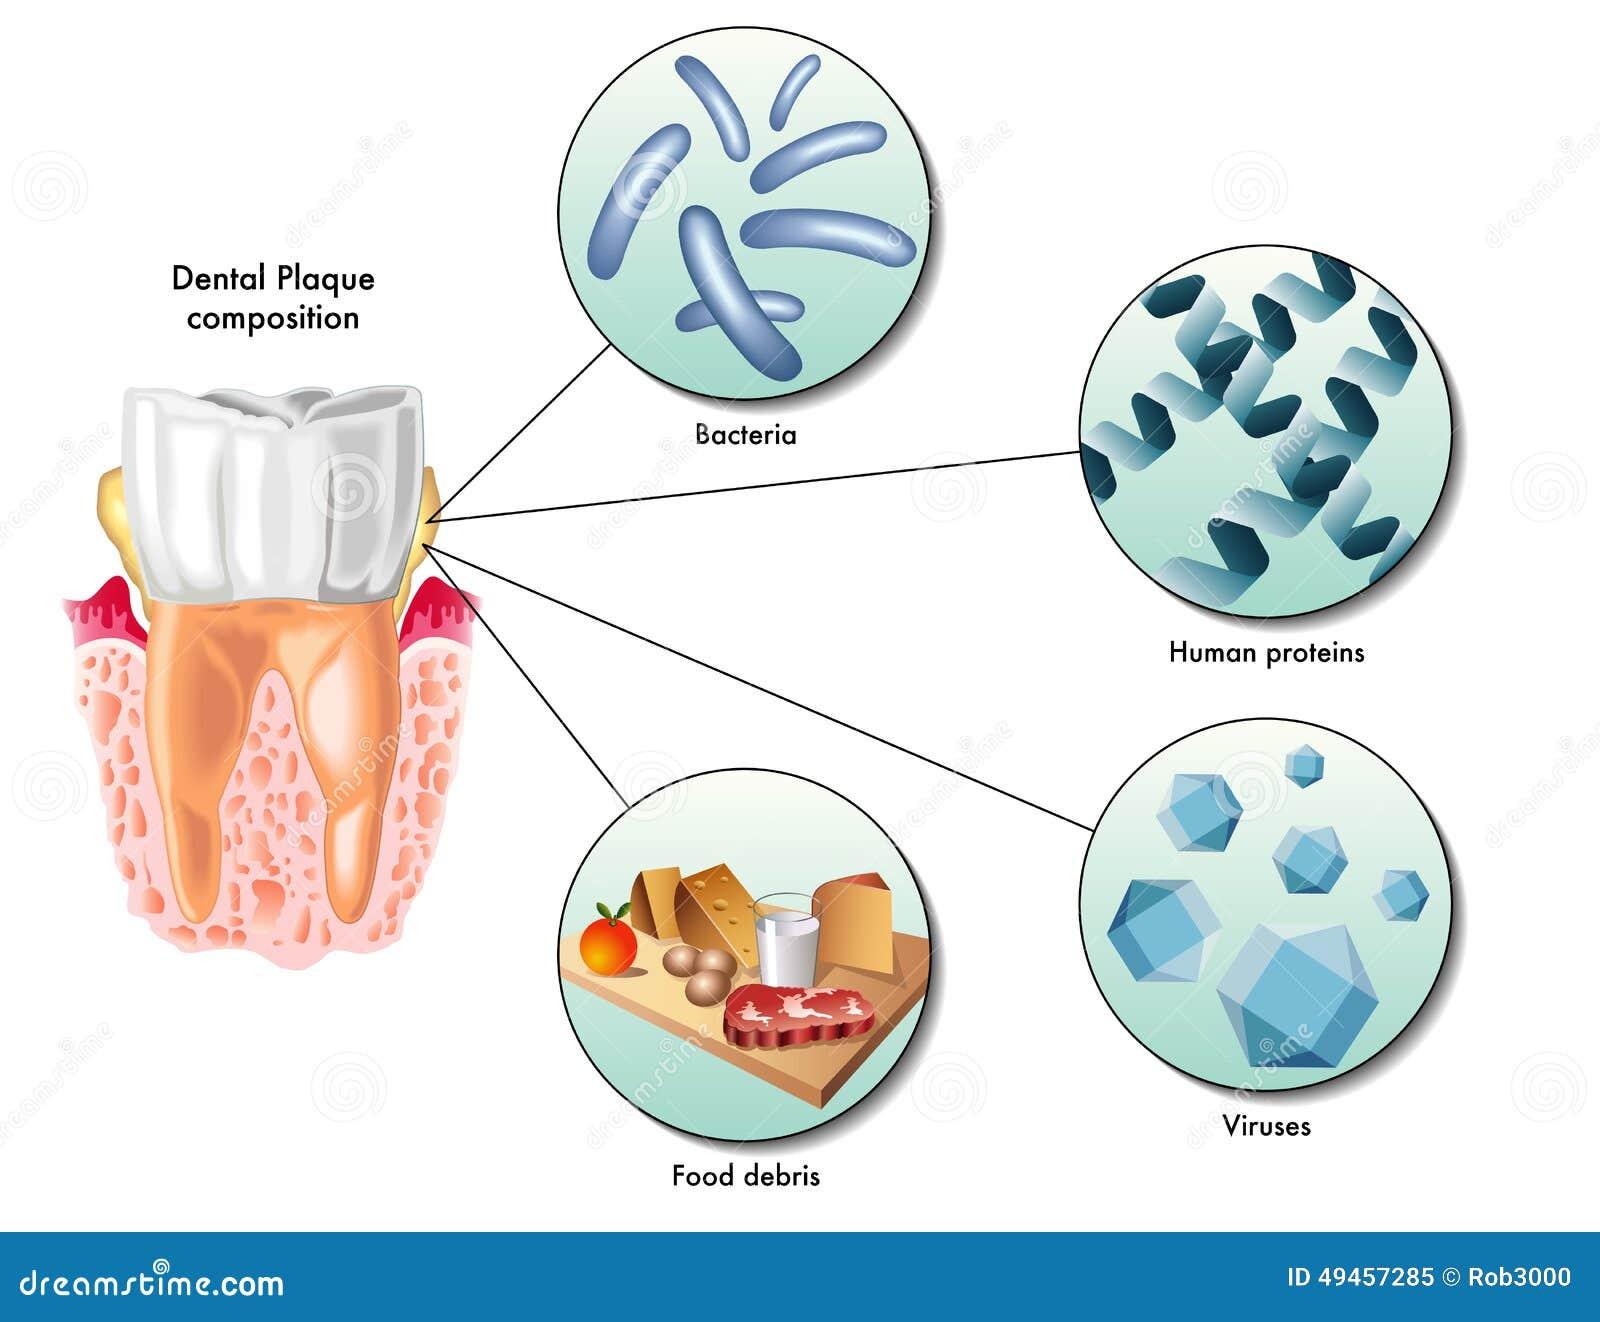 Natural Treatment Protocol For Pnemonia